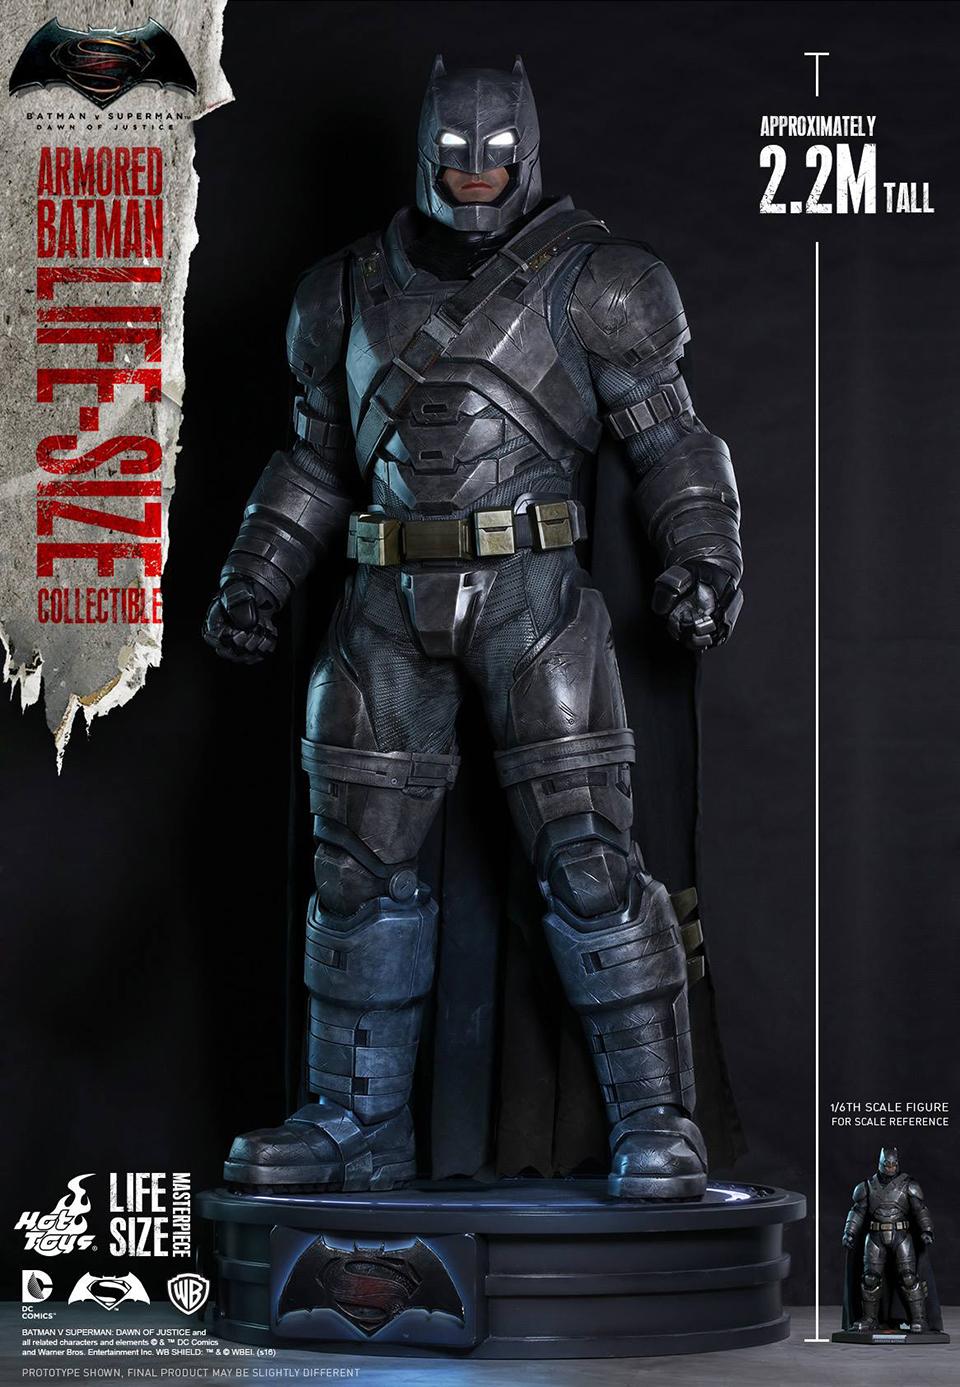 Hot Toys BvS Armored Batman Life-size Statue